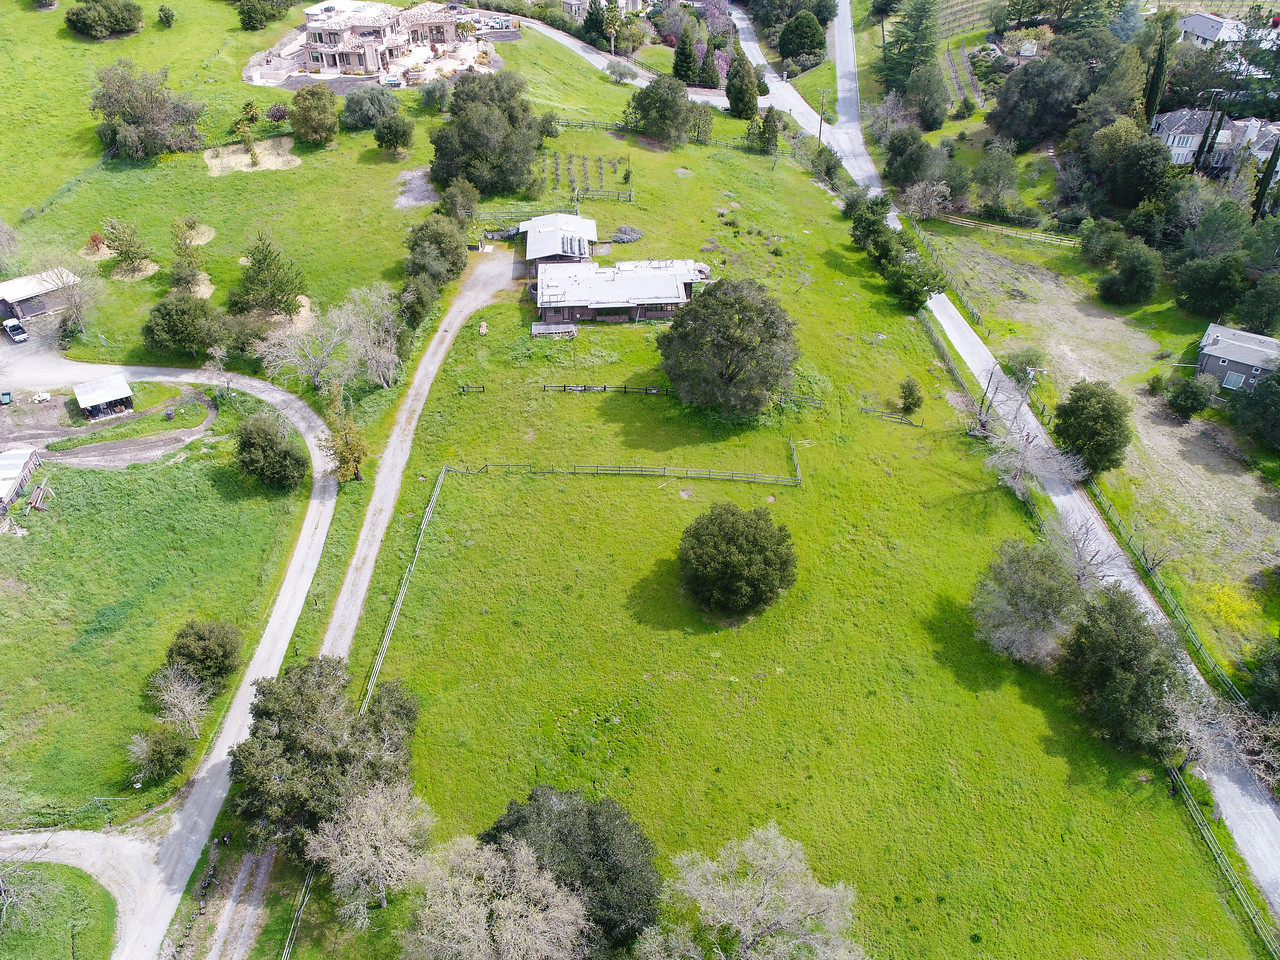 13830 Page Mill Drone Blu Skye Media-0015-X2.jpg